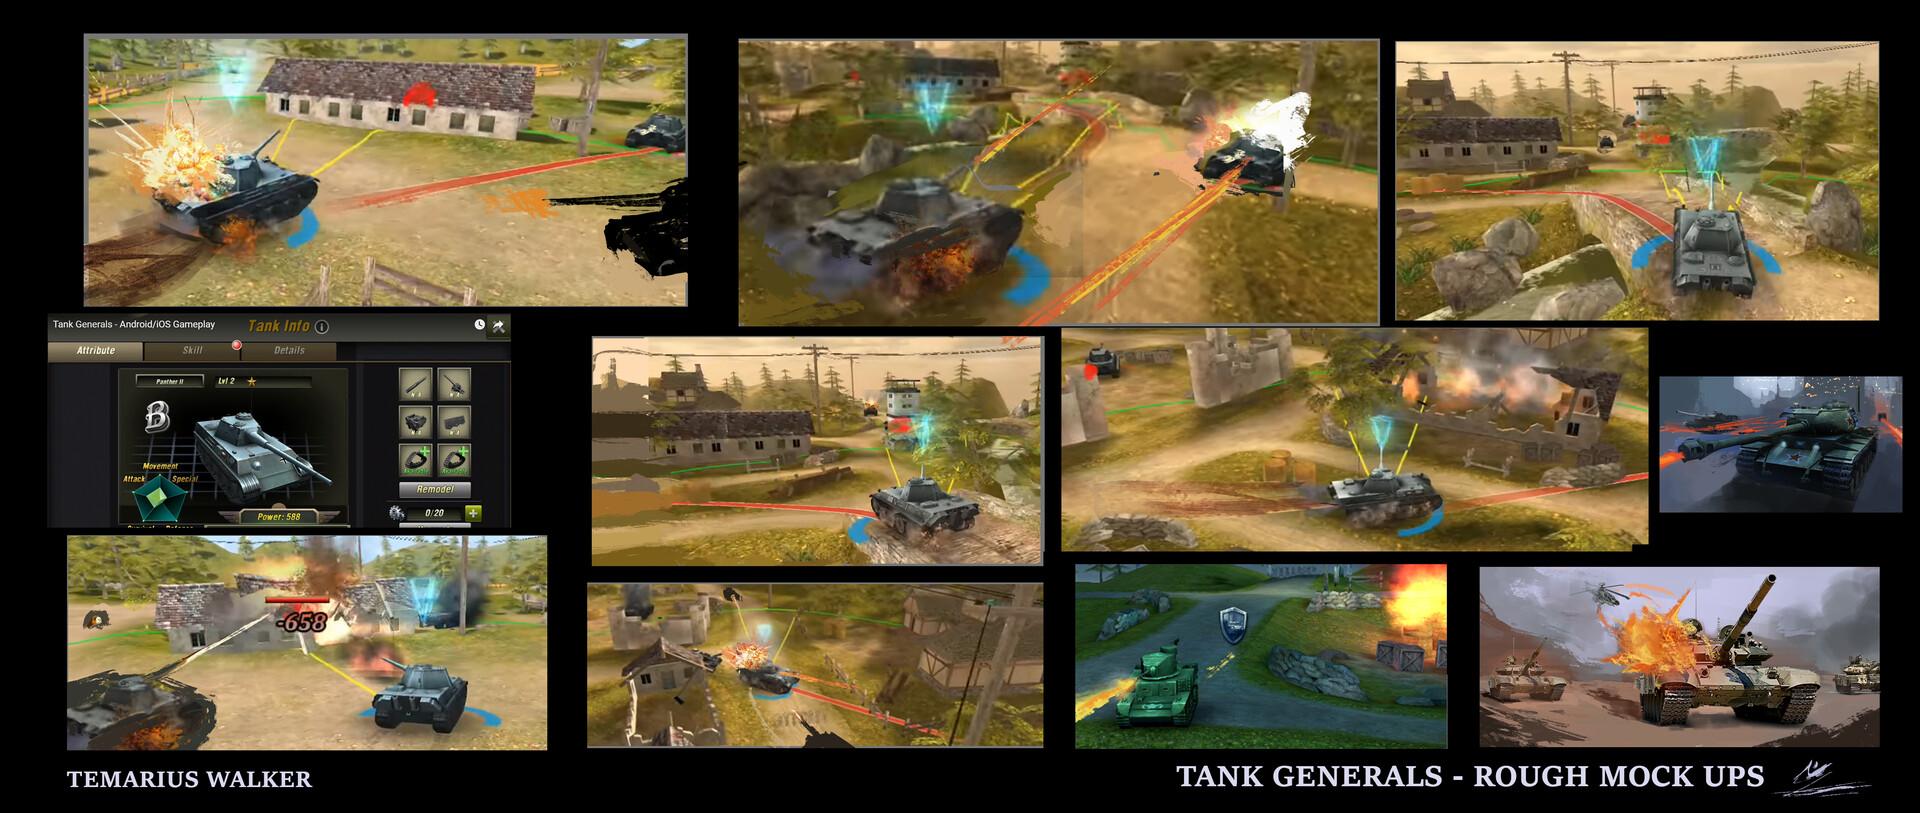 Temarius walker tank mock ups 01